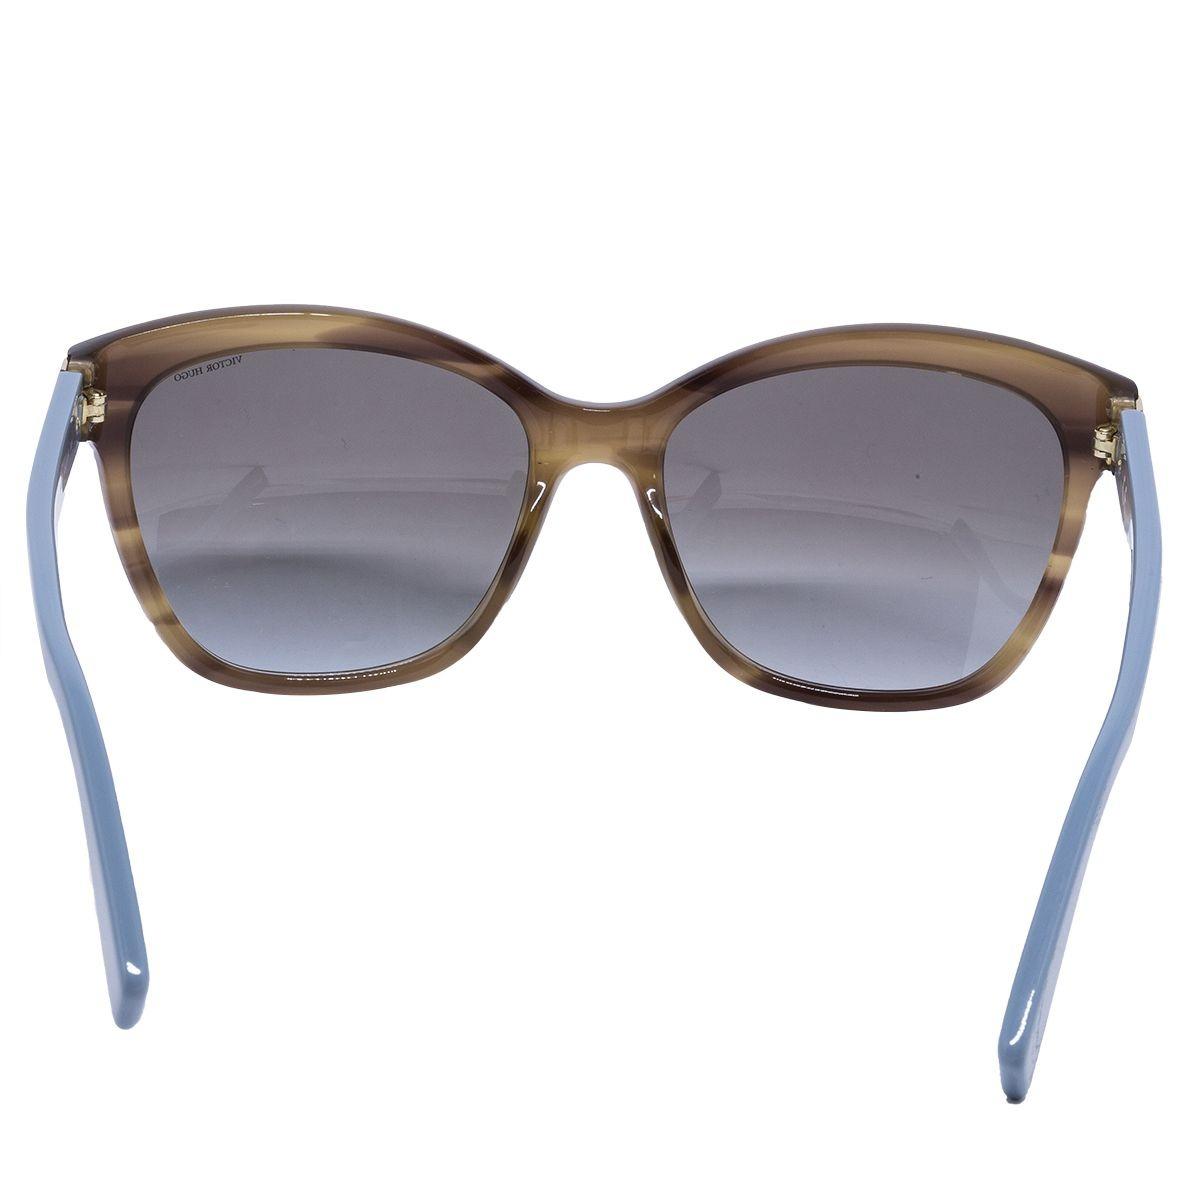 b3f552cc2c5f6 óculos de sol victor hugo original feminino sh1741. Carregando zoom.